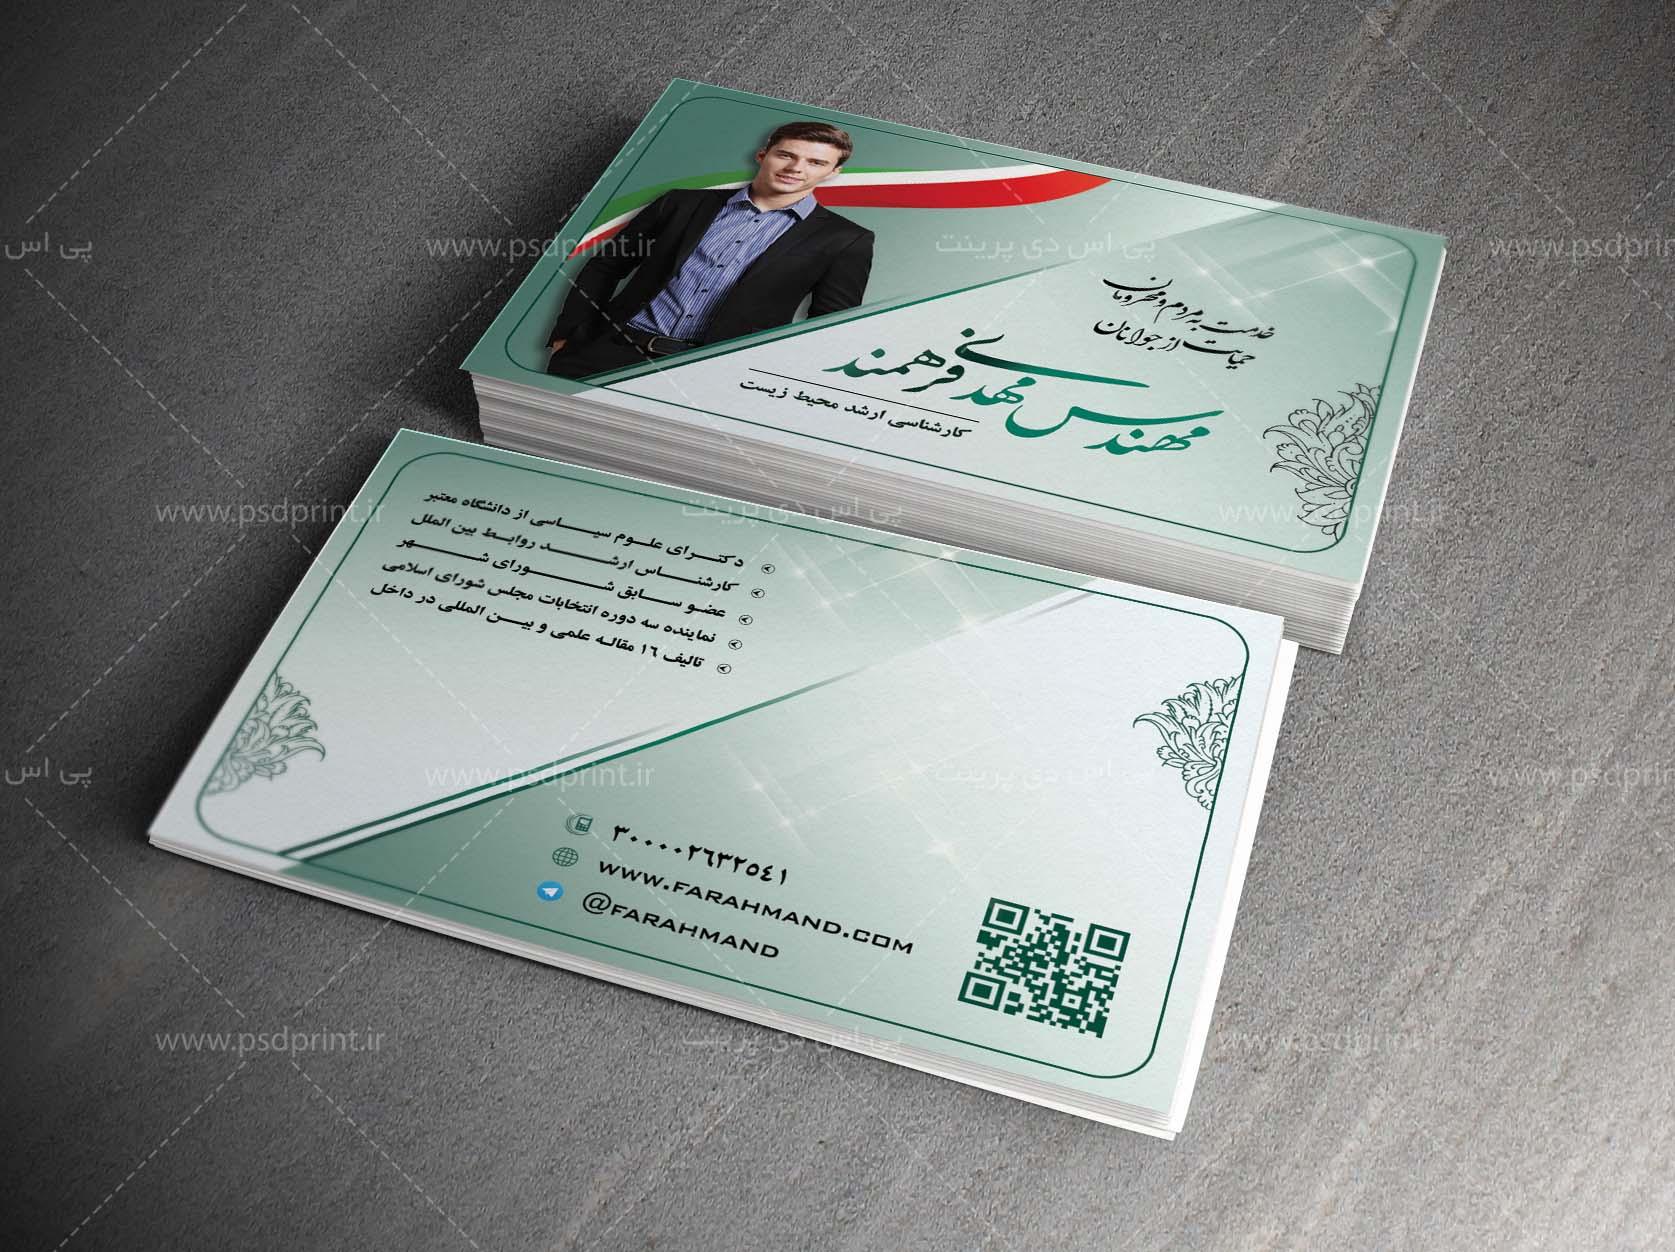 کارت ویزت انتخابات شورای اسلامی